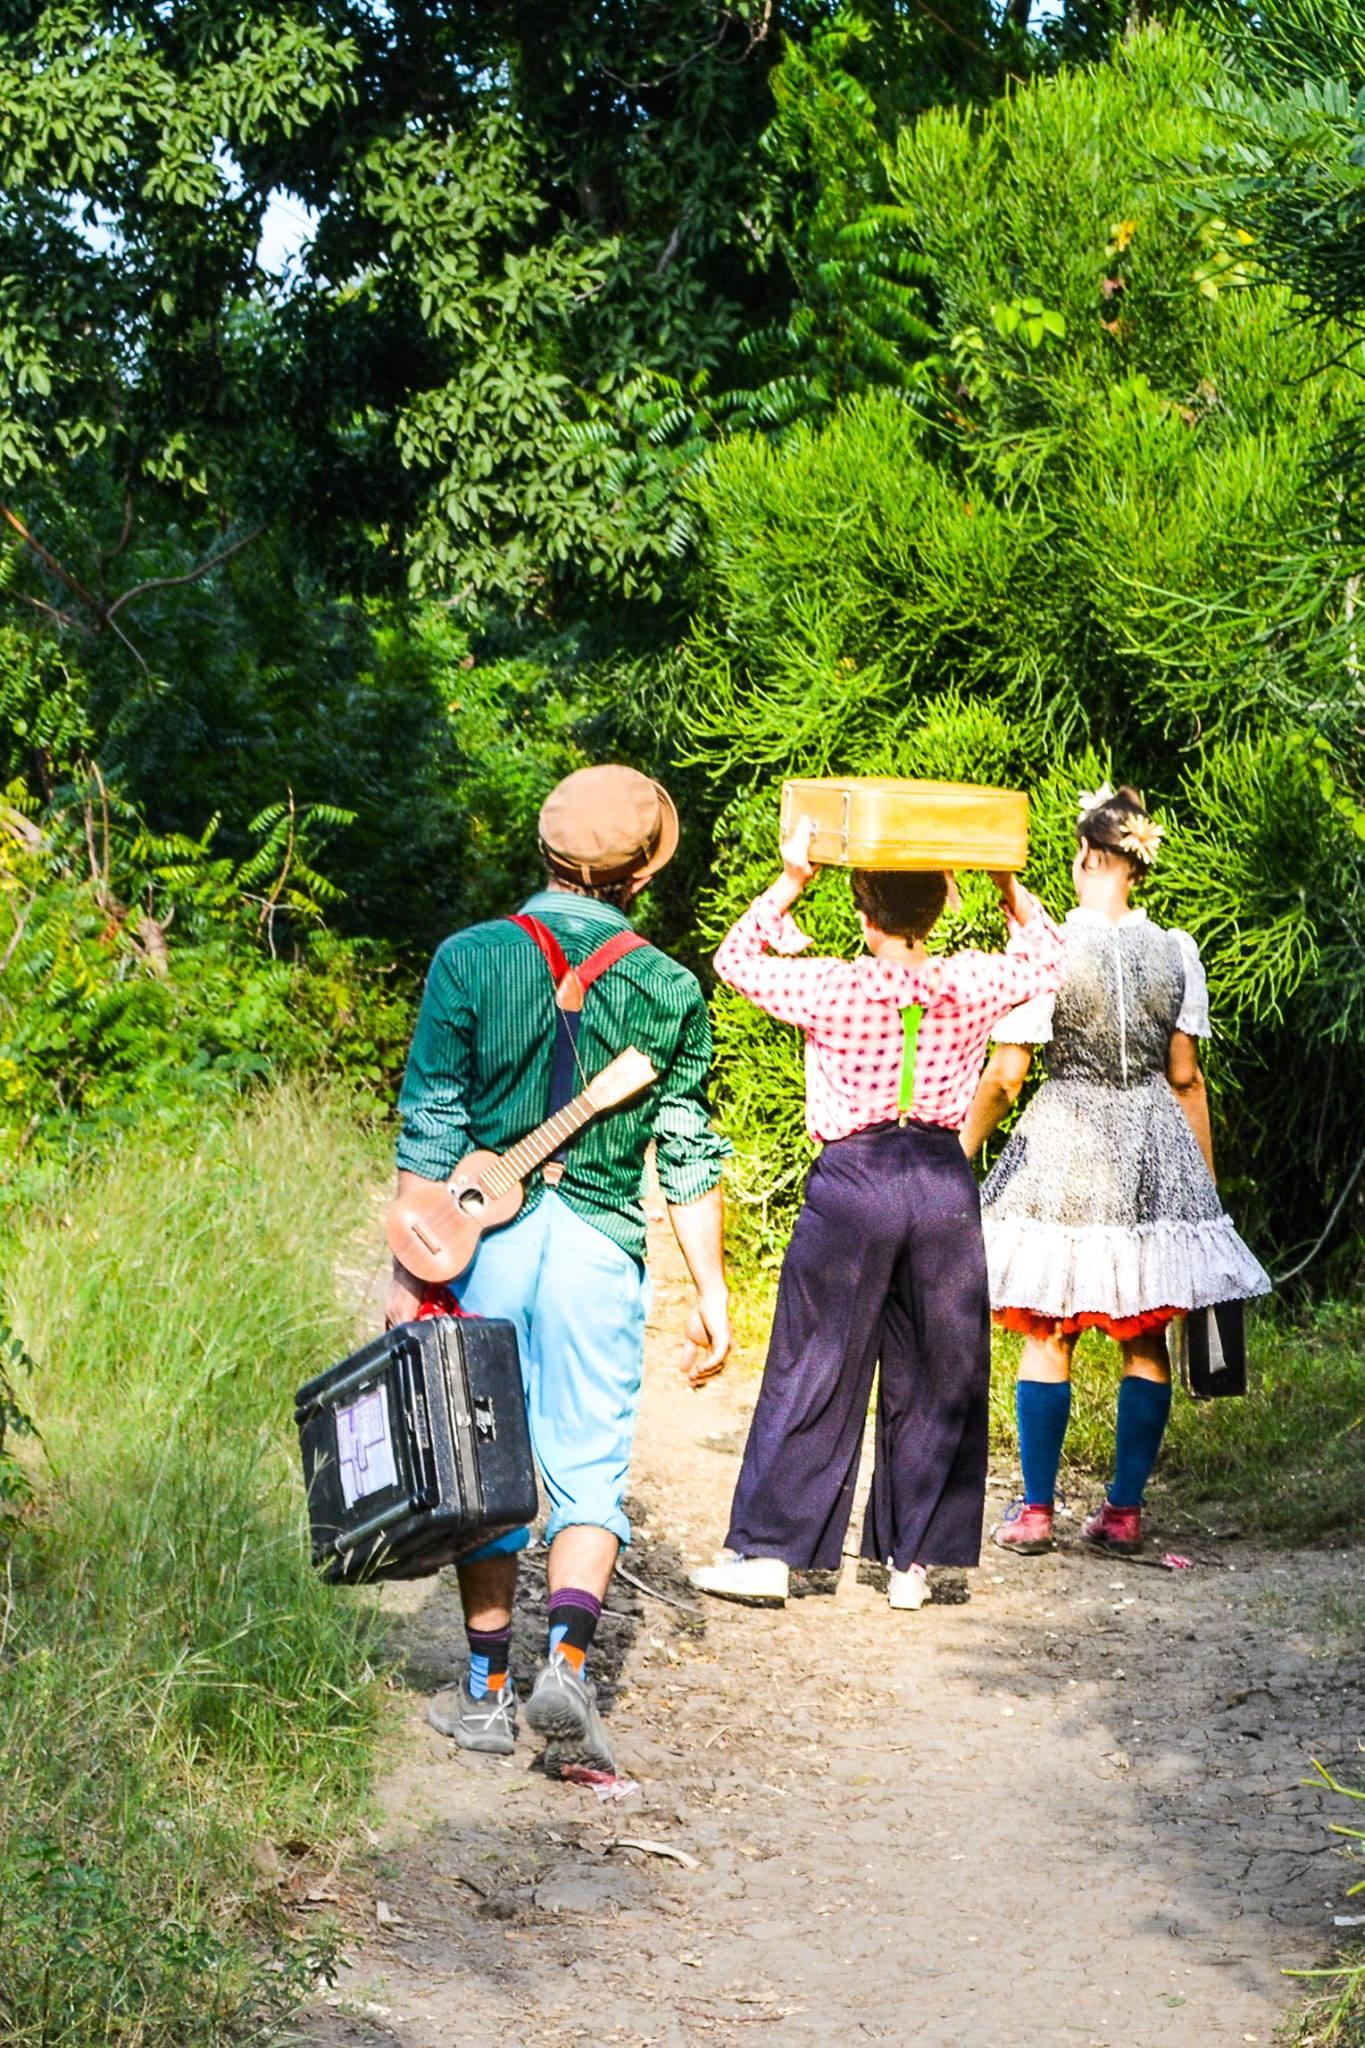 Three clowns walk into the jungle in Haiti